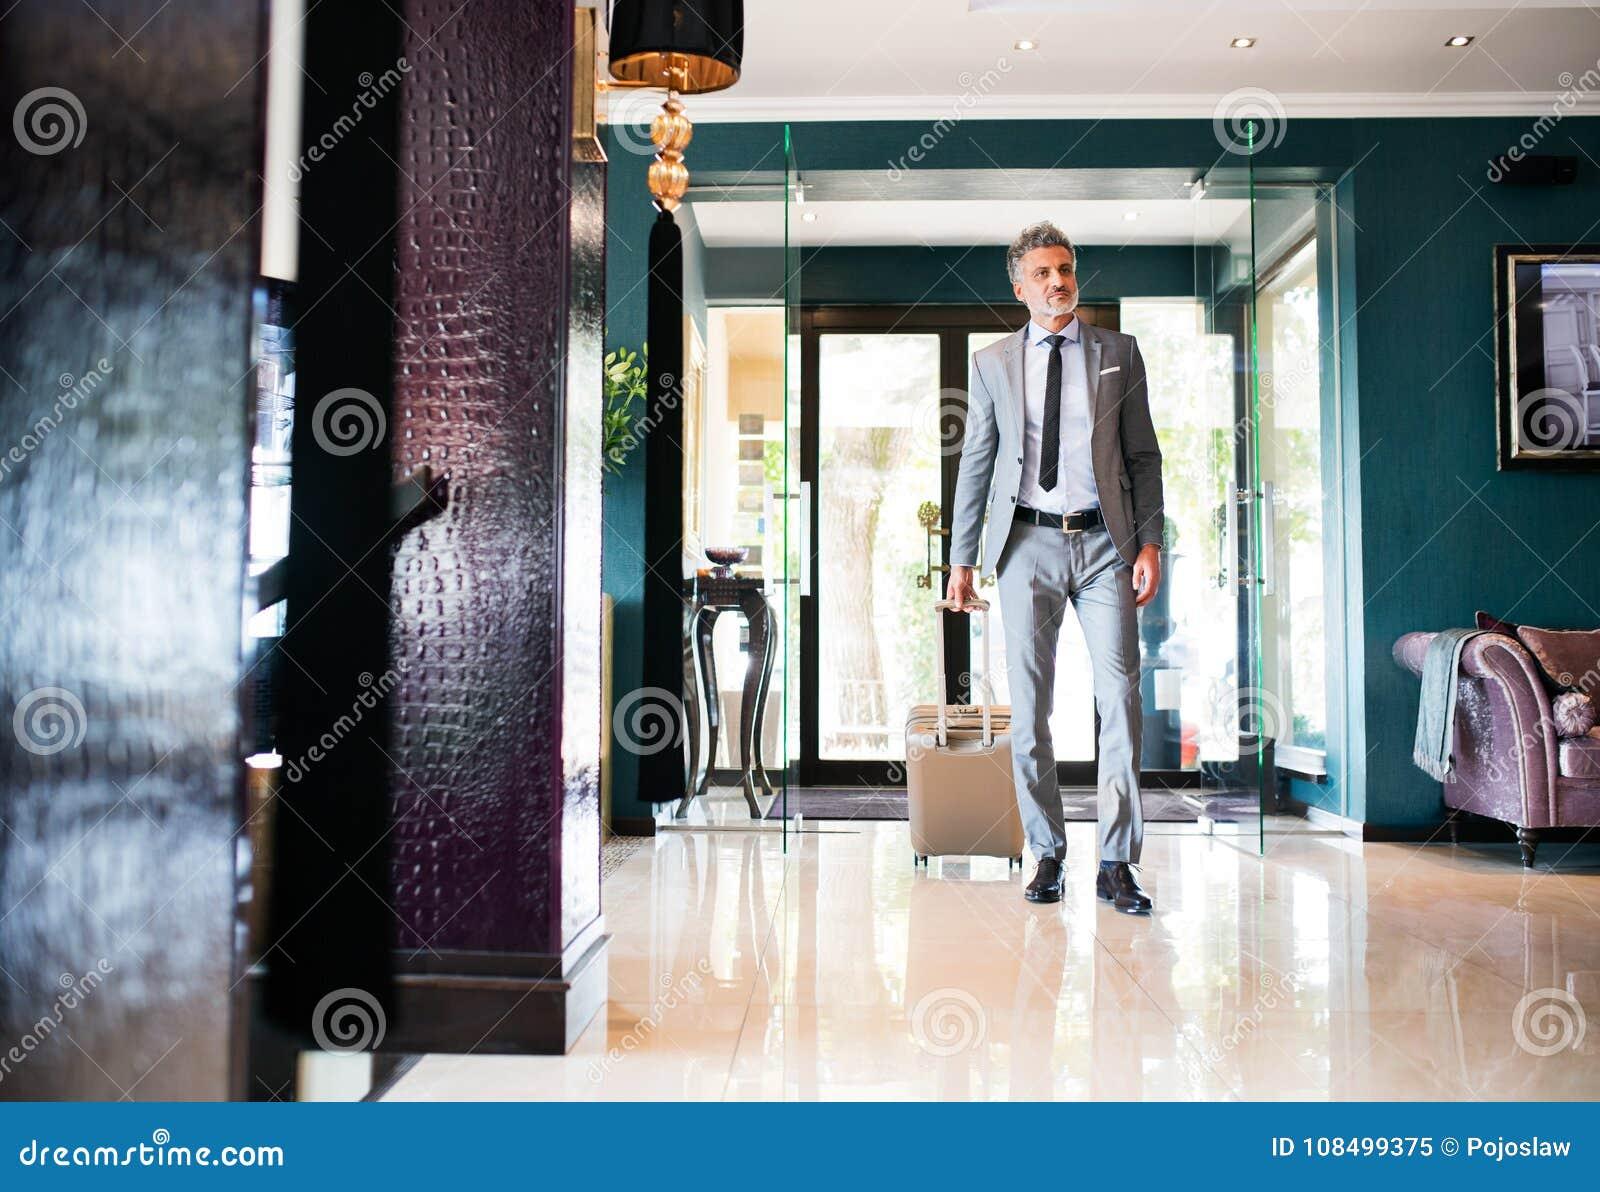 Hotel Entrance Foyer : Mature businessman entering hotel with luggage stock image